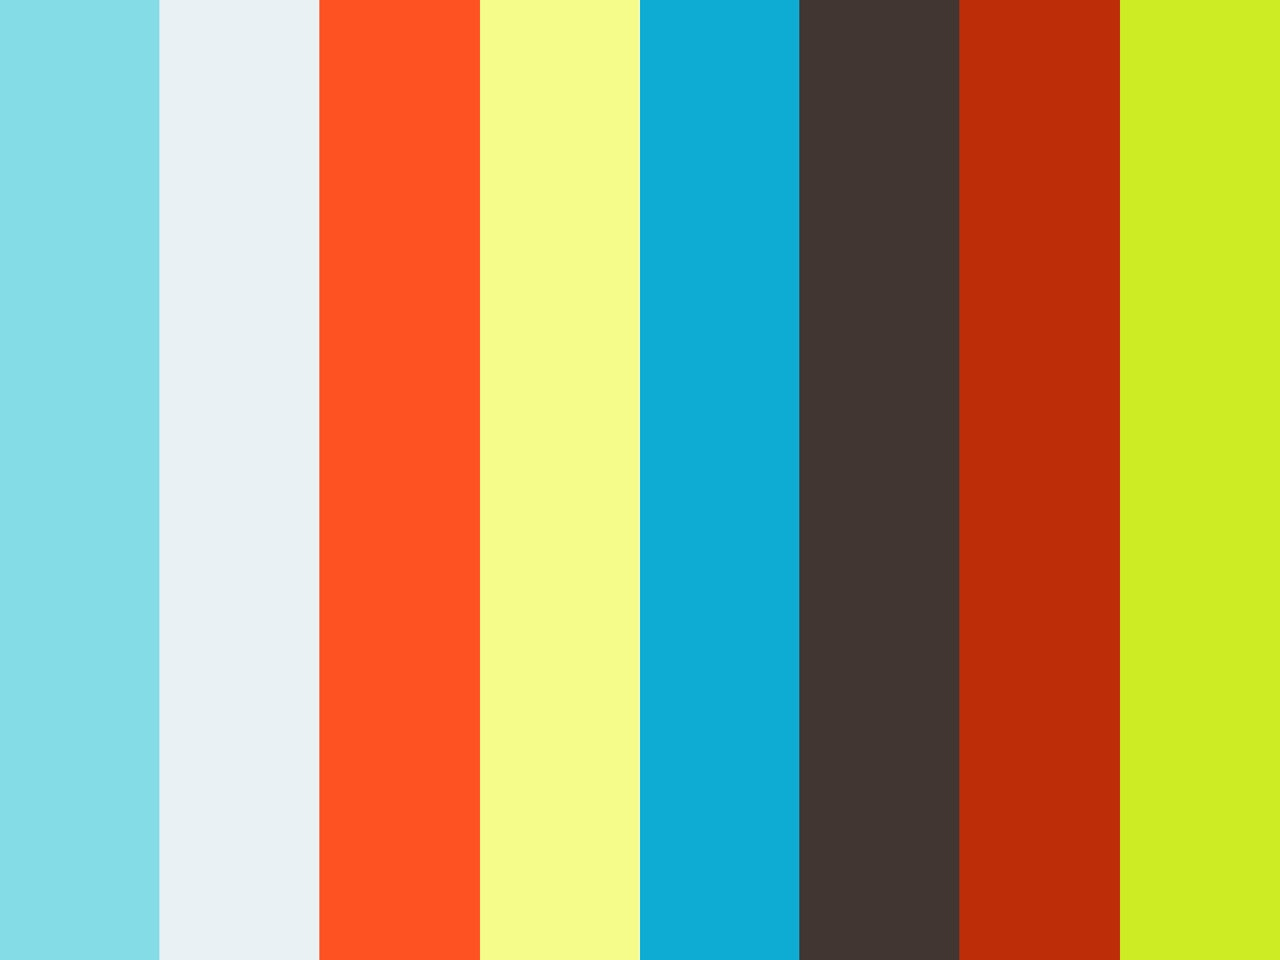 ERA - Speed / Iterate / Visualise